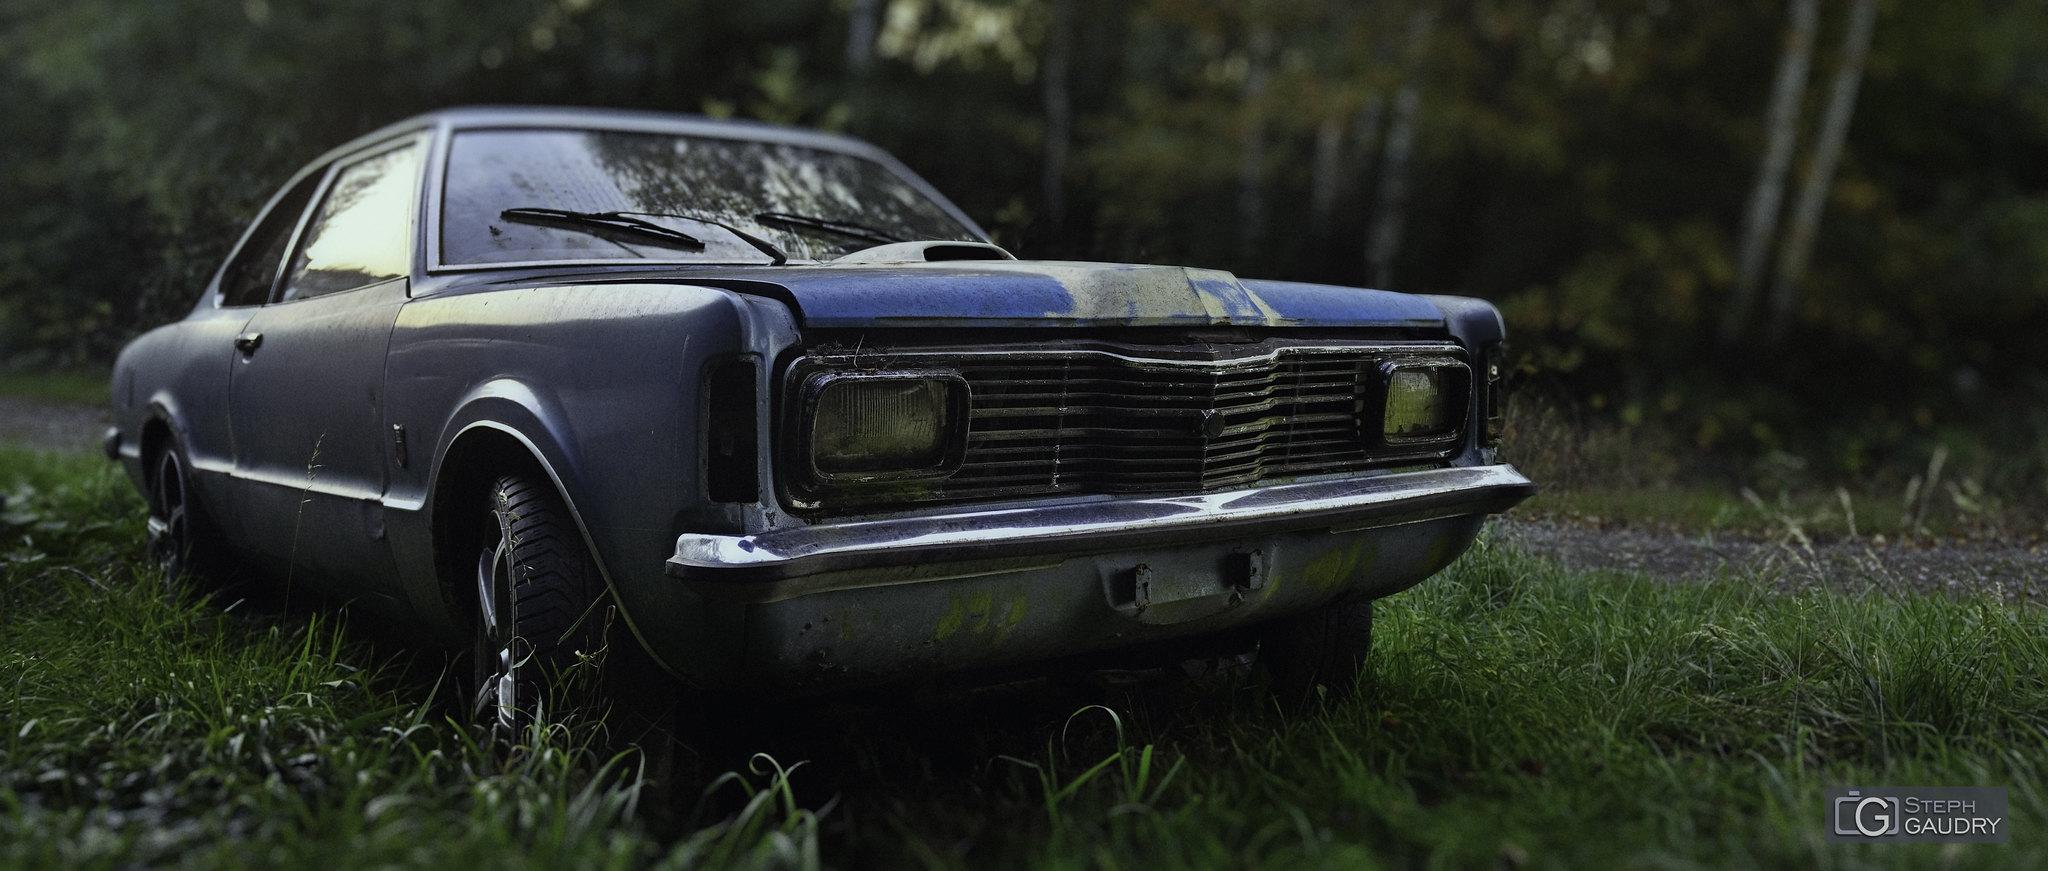 Ford abandonnée (Tilt shift) [Klik om de diavoorstelling te starten]